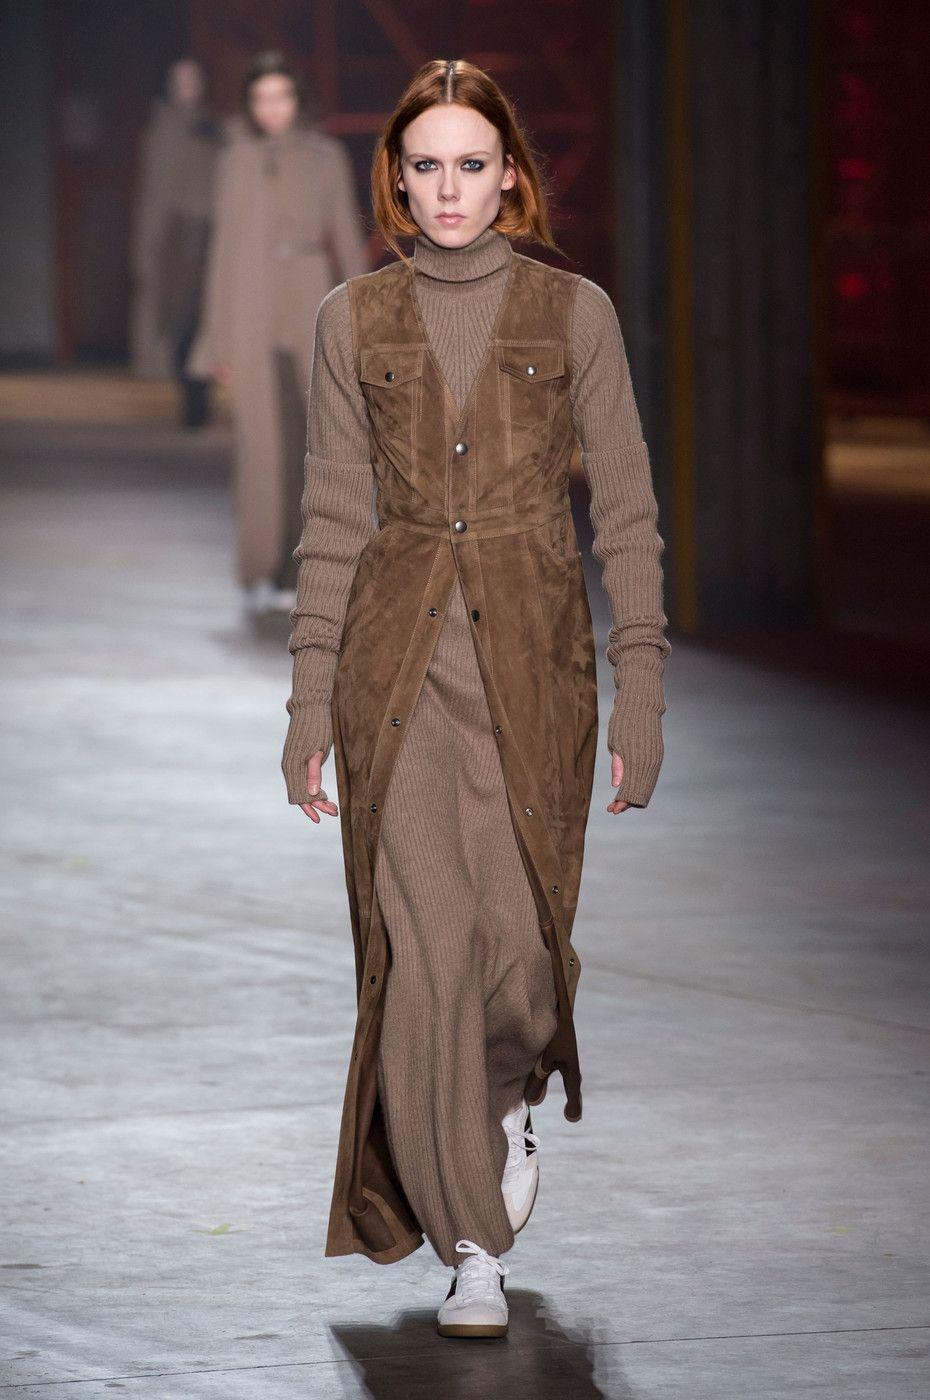 Diesel Black Gold at Milan Fashion Week Fall 2017 - Livingly